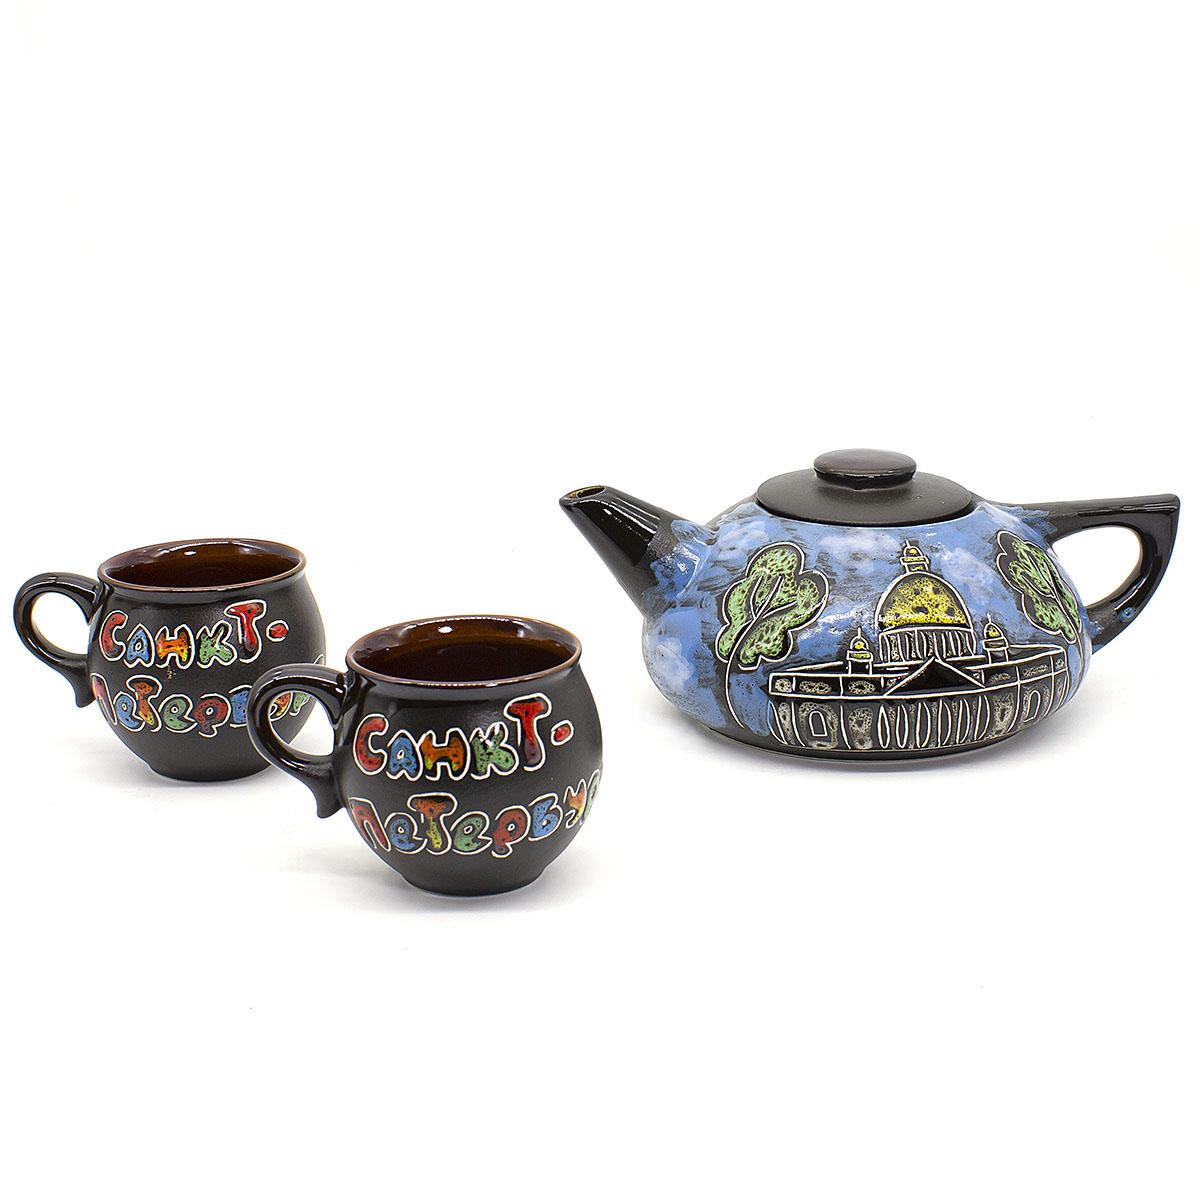 цена на Набор Санкт-Петербург: 2 чашки 200 мл и чайник 750 мл